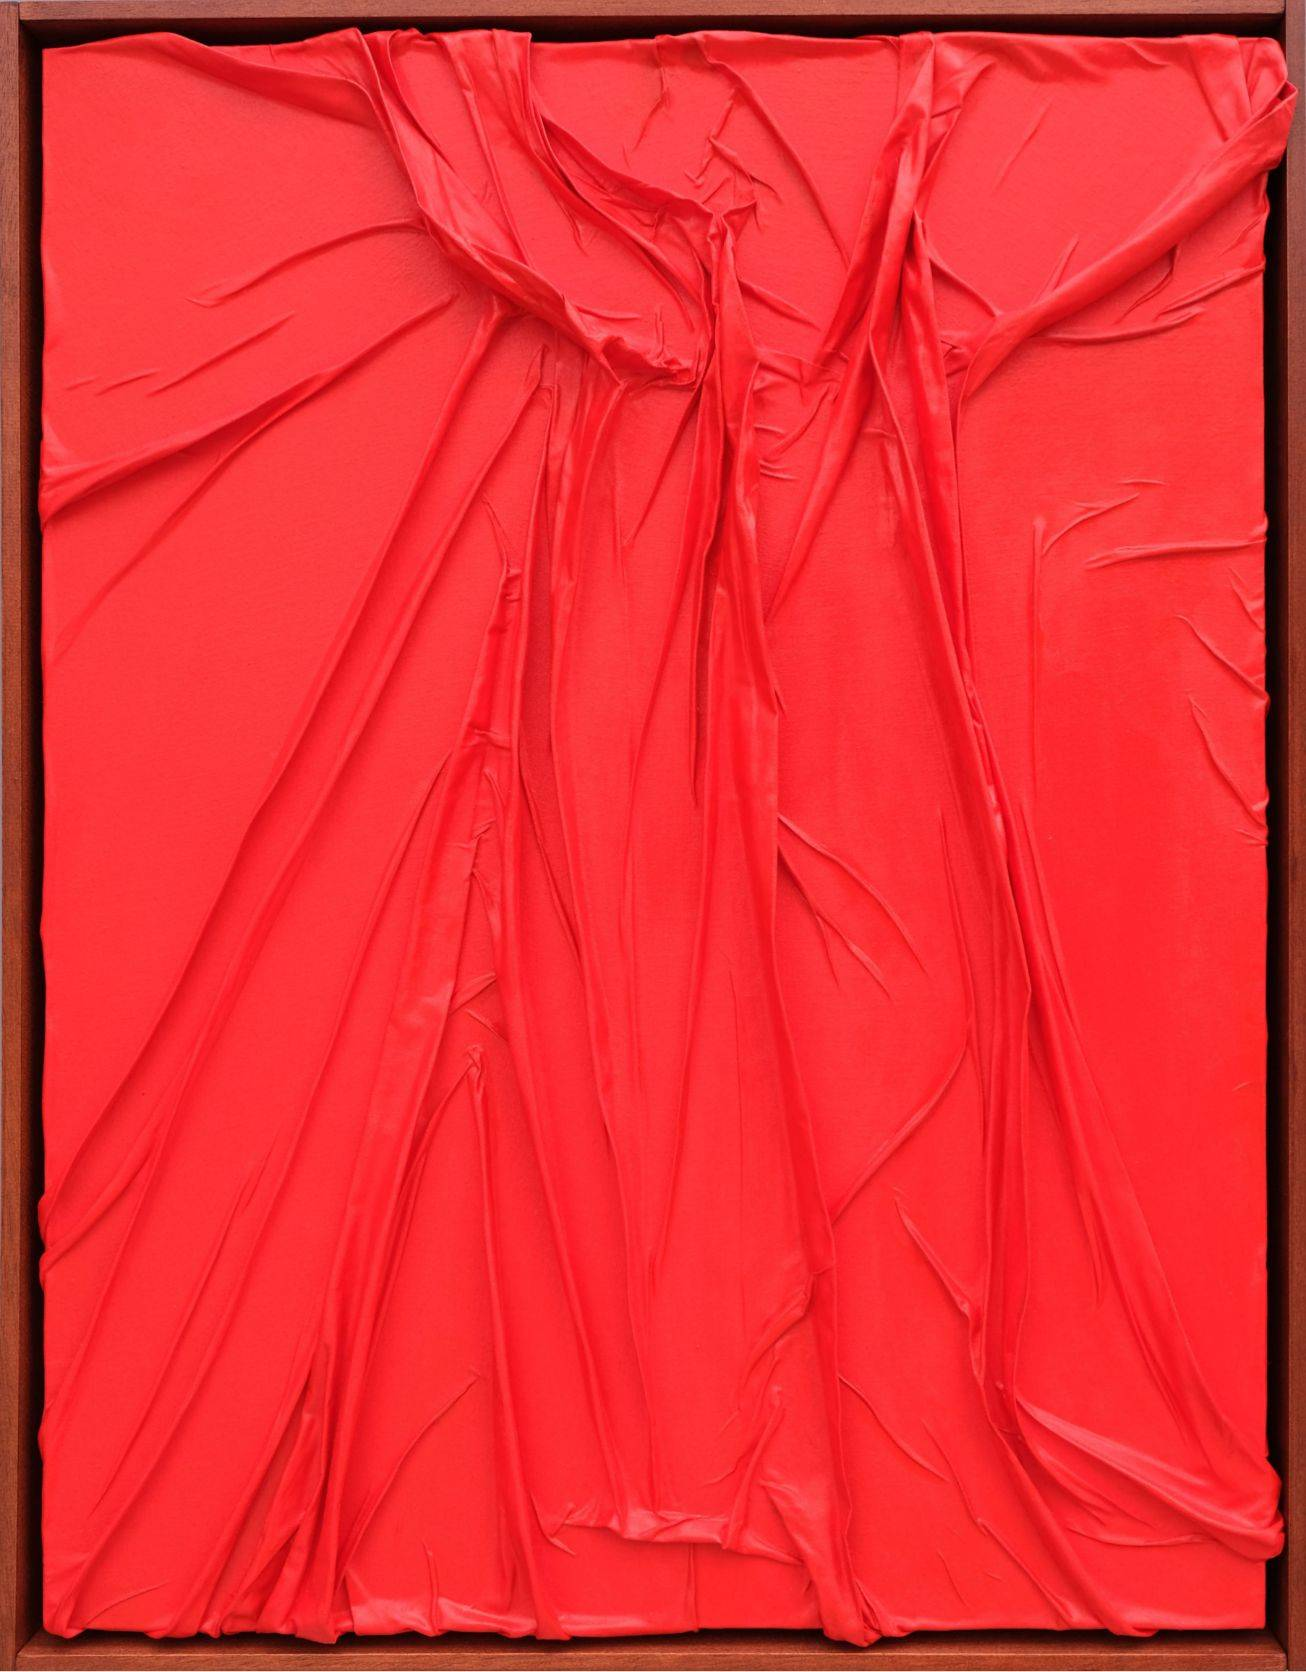 Elastic Tension Red 03